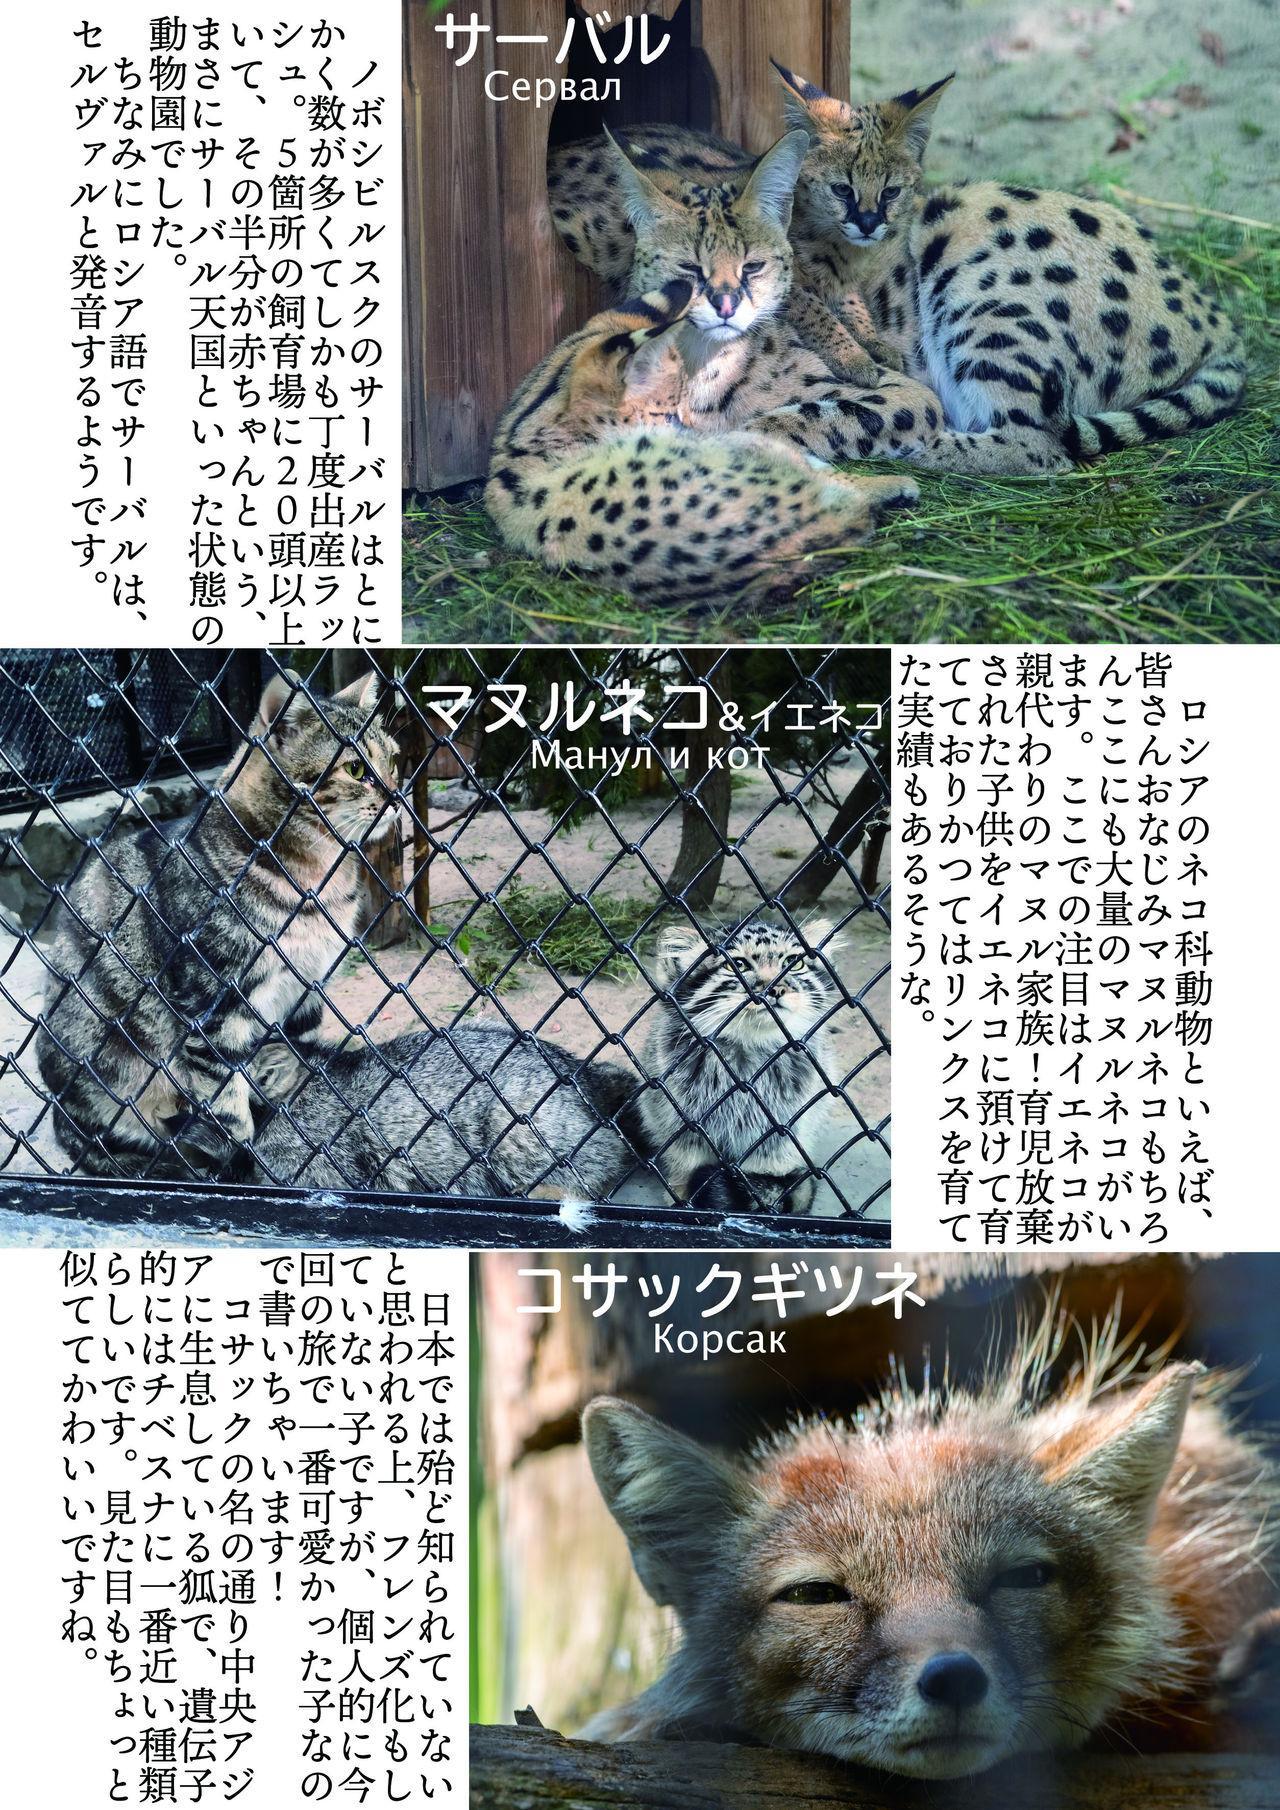 may Kemono Friends Thre Goudoushi 2 161